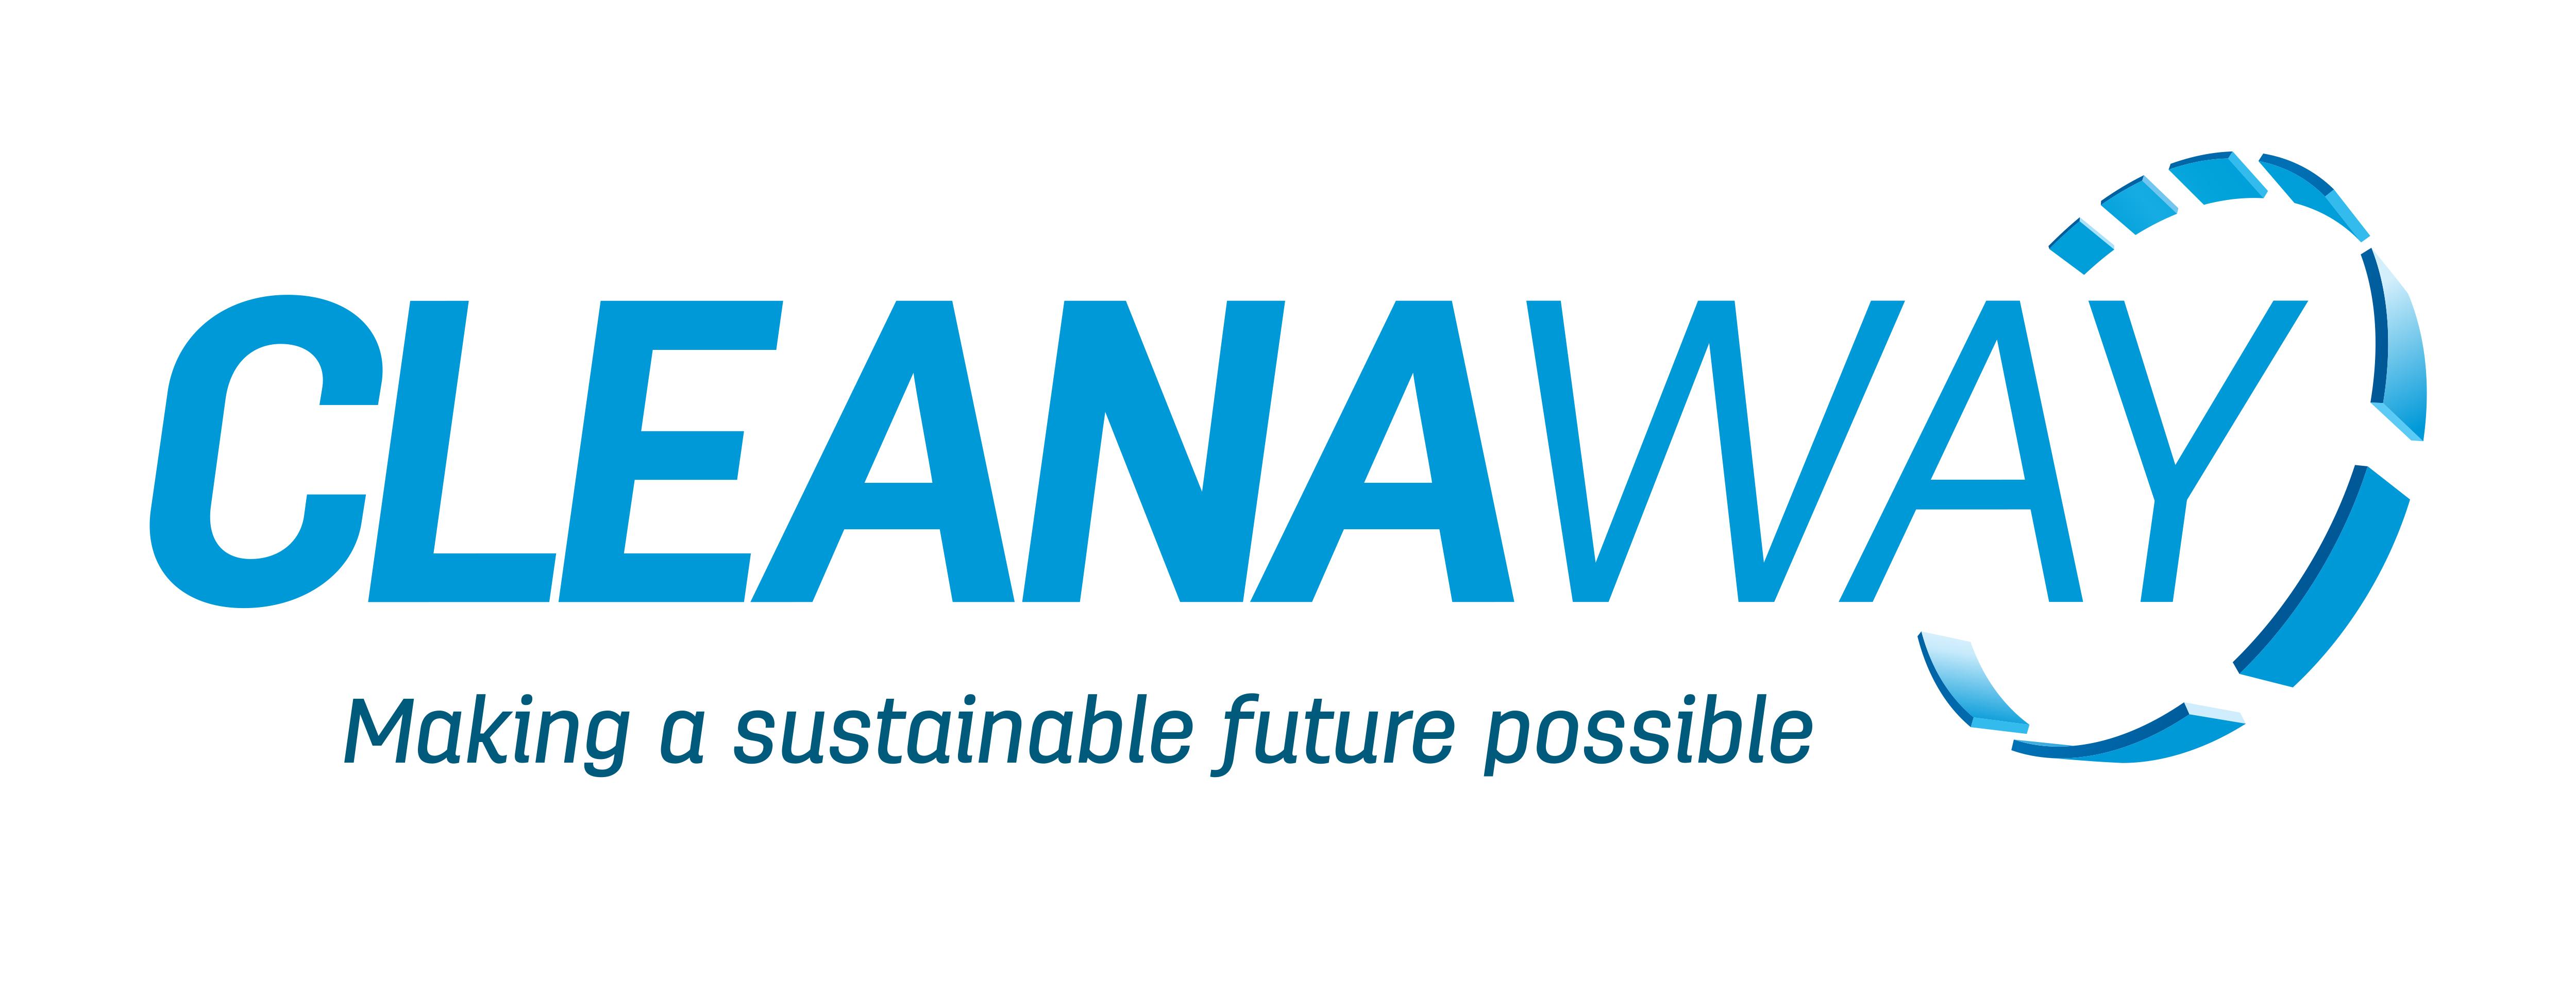 Cleanaway logo